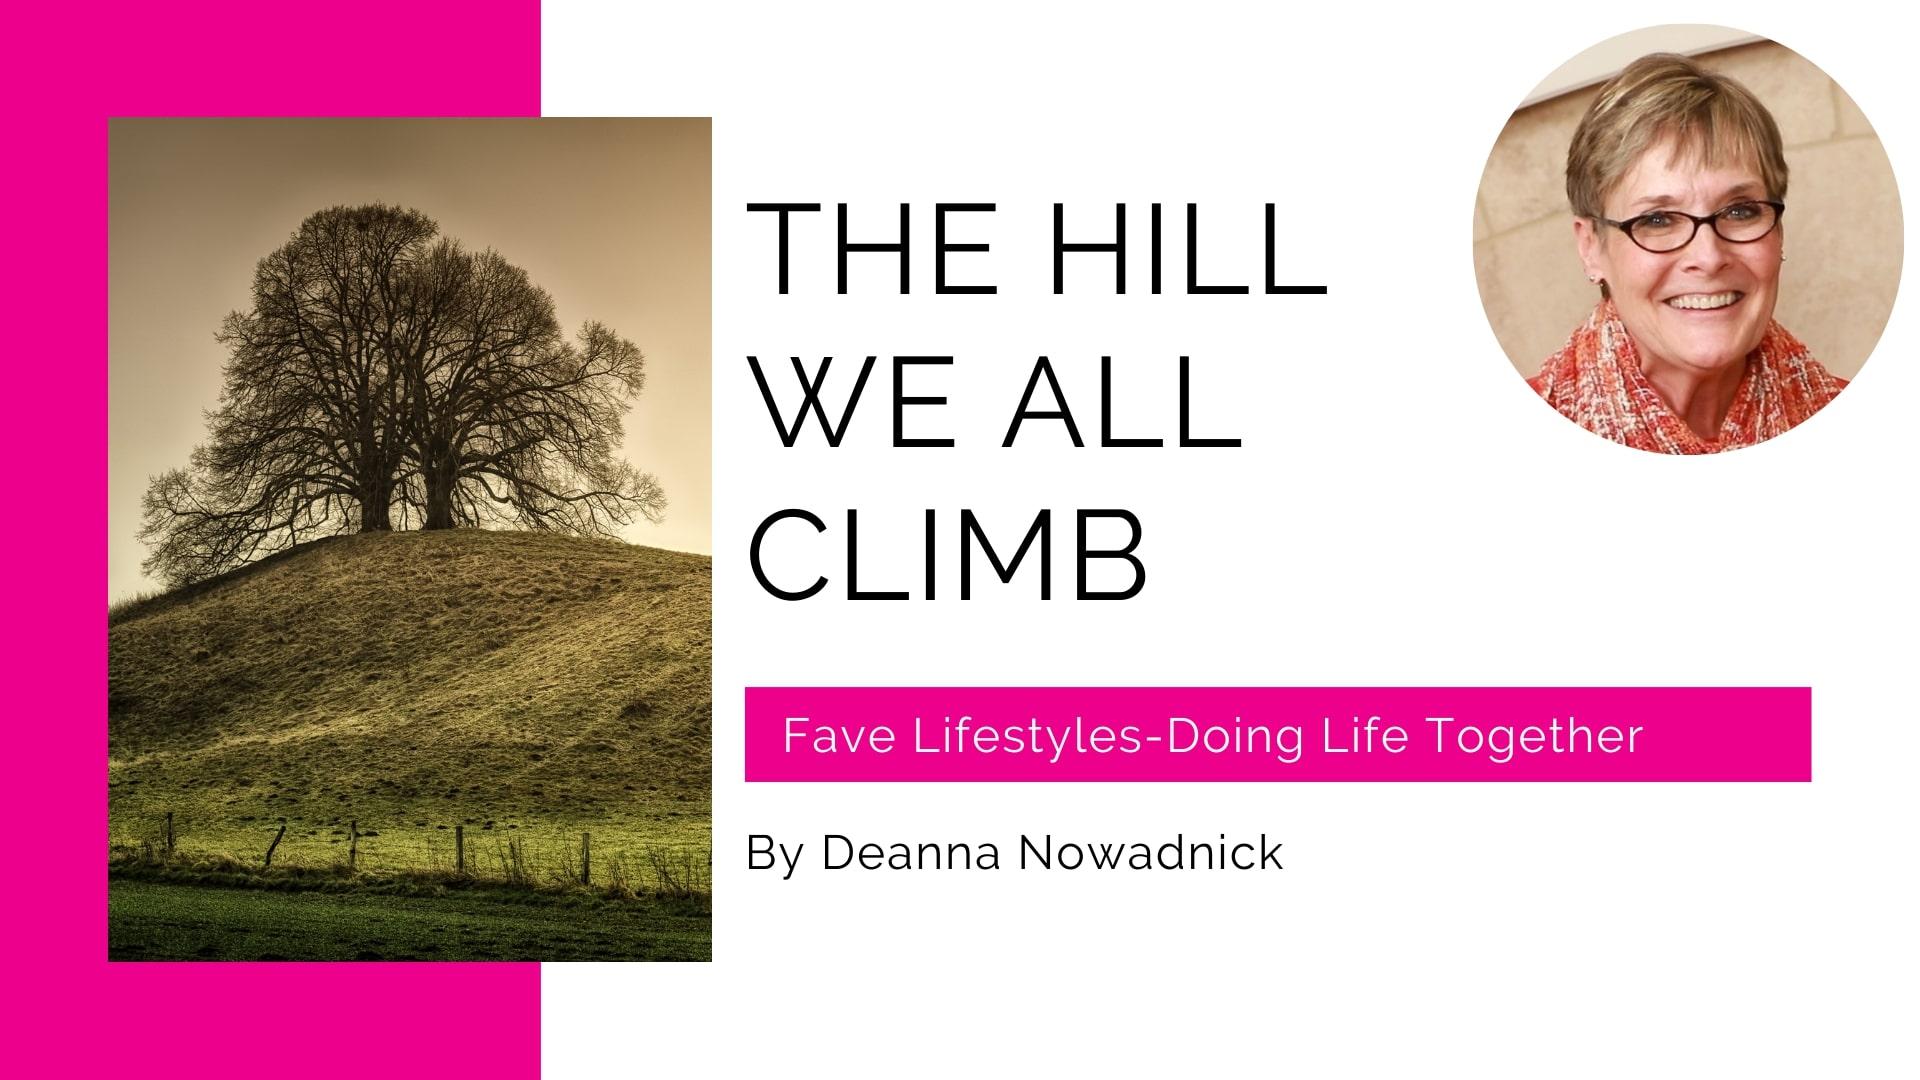 The Hill We All Climb